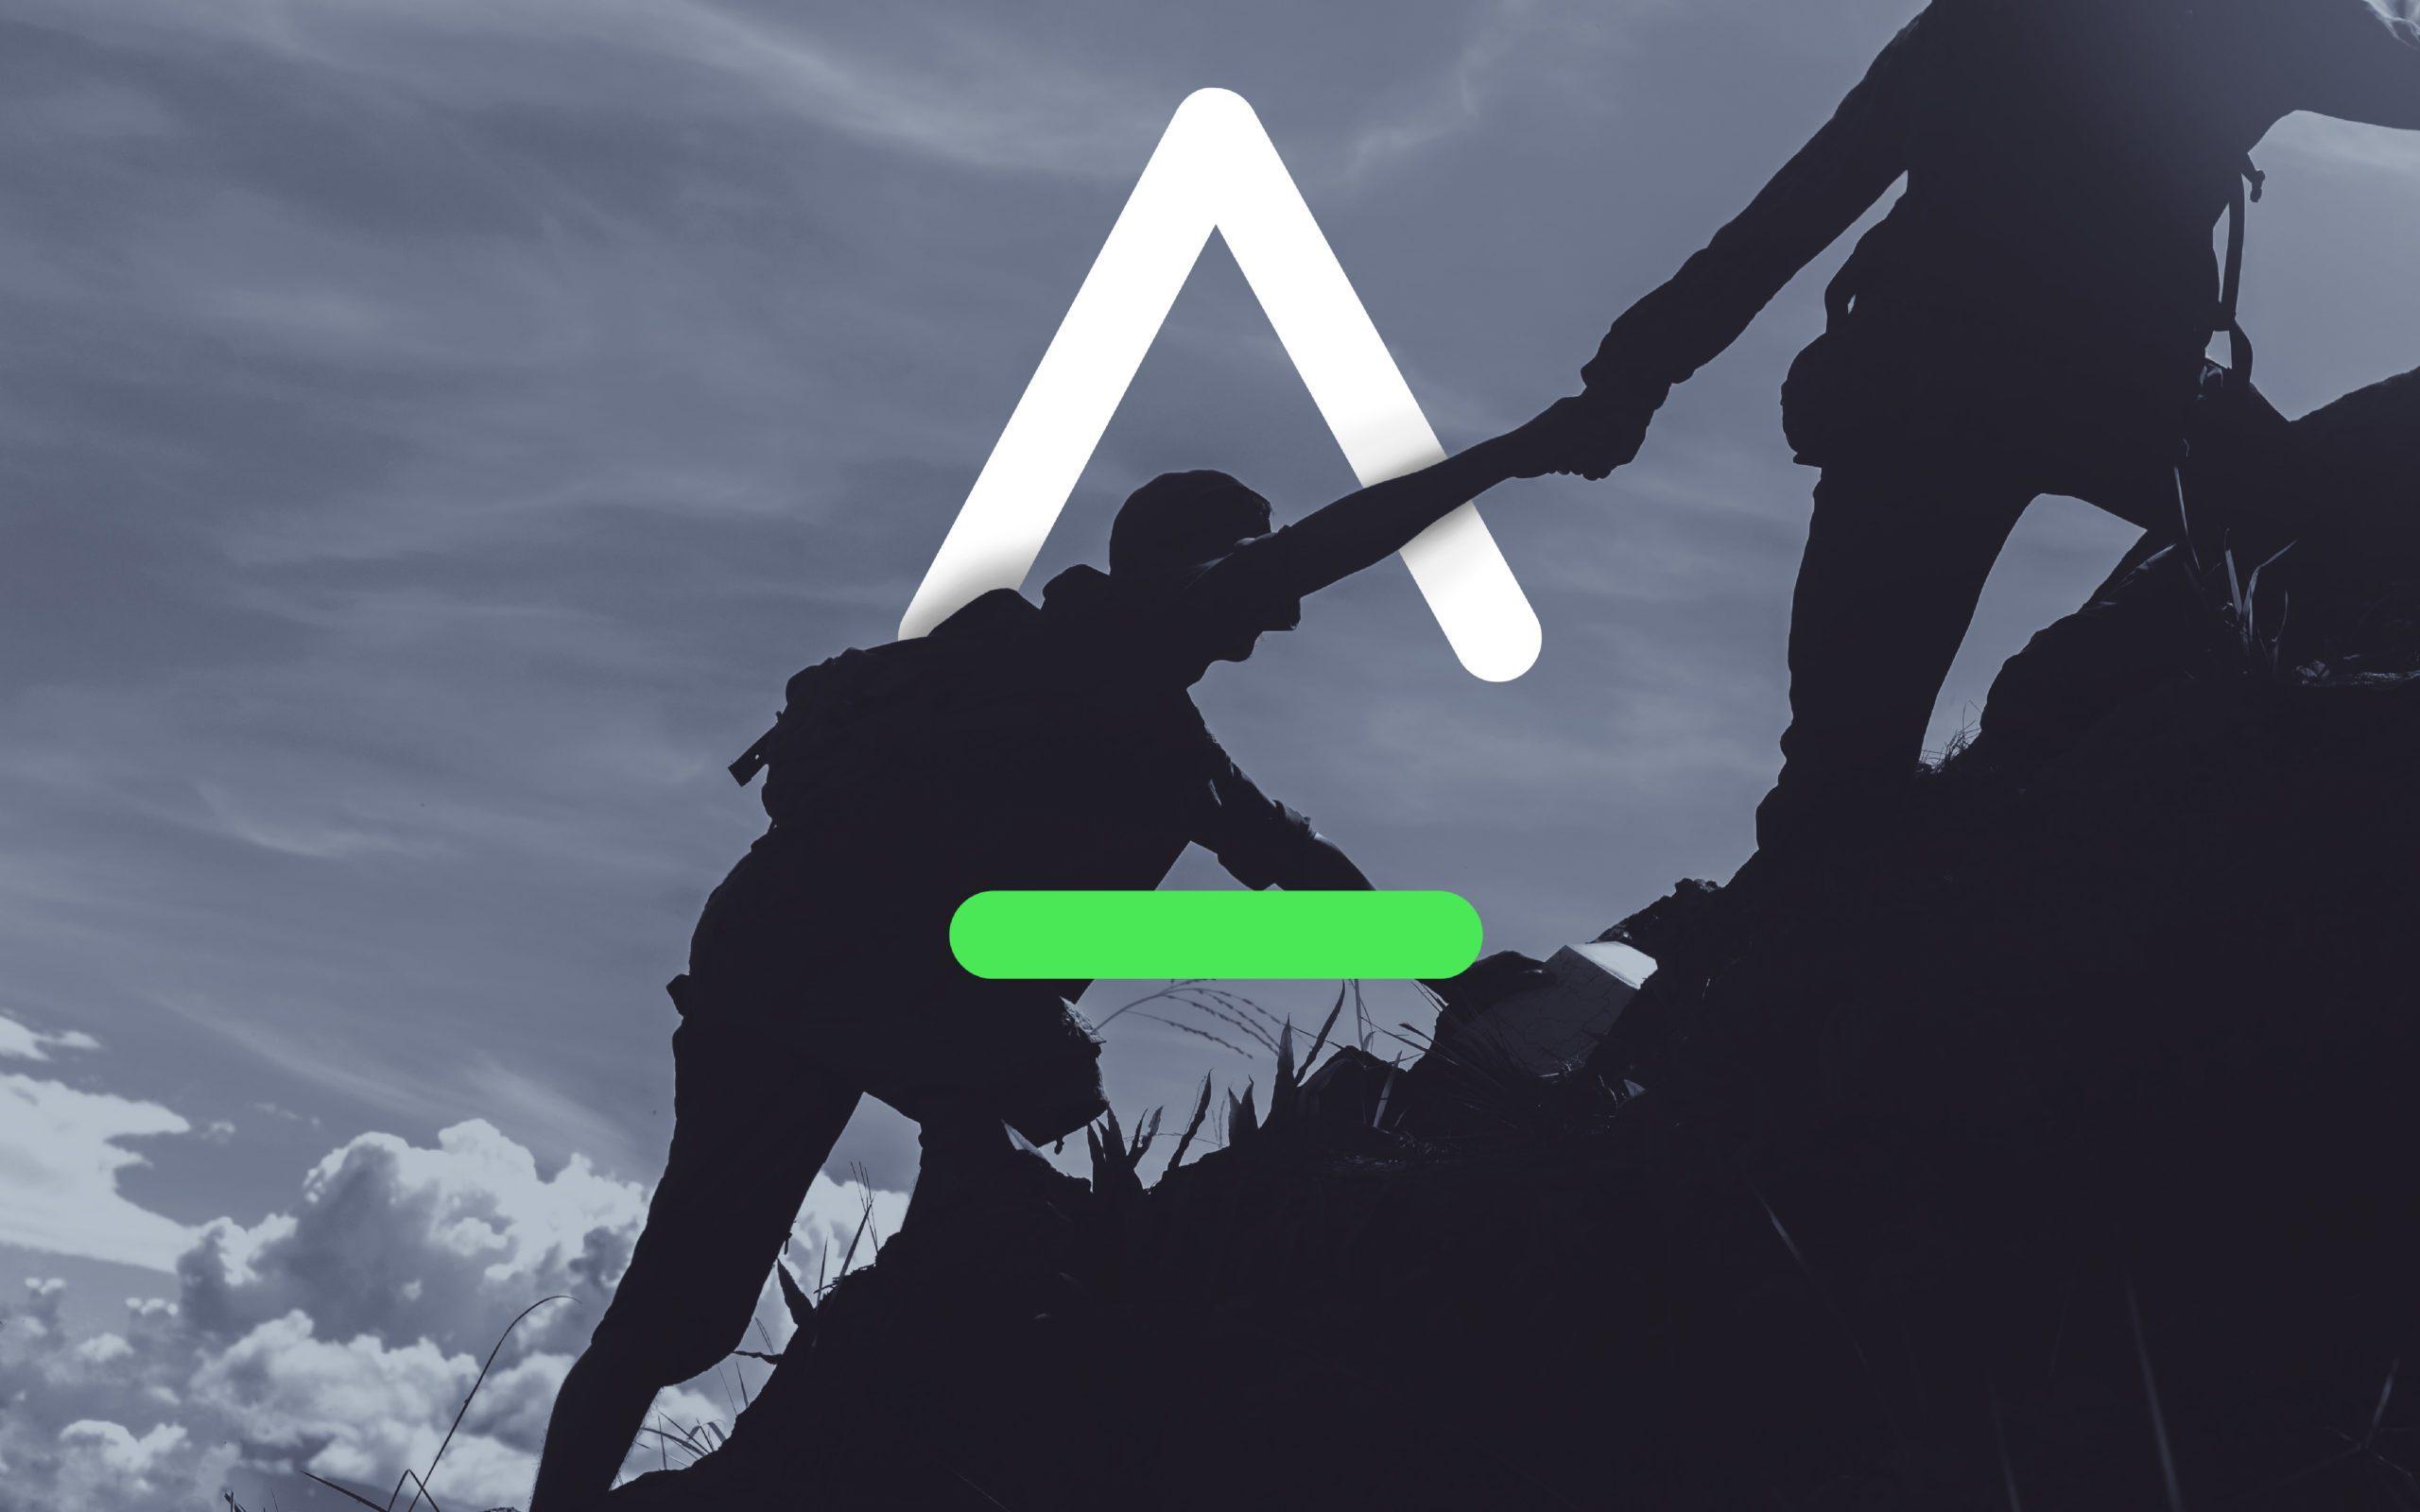 site-avanter-40